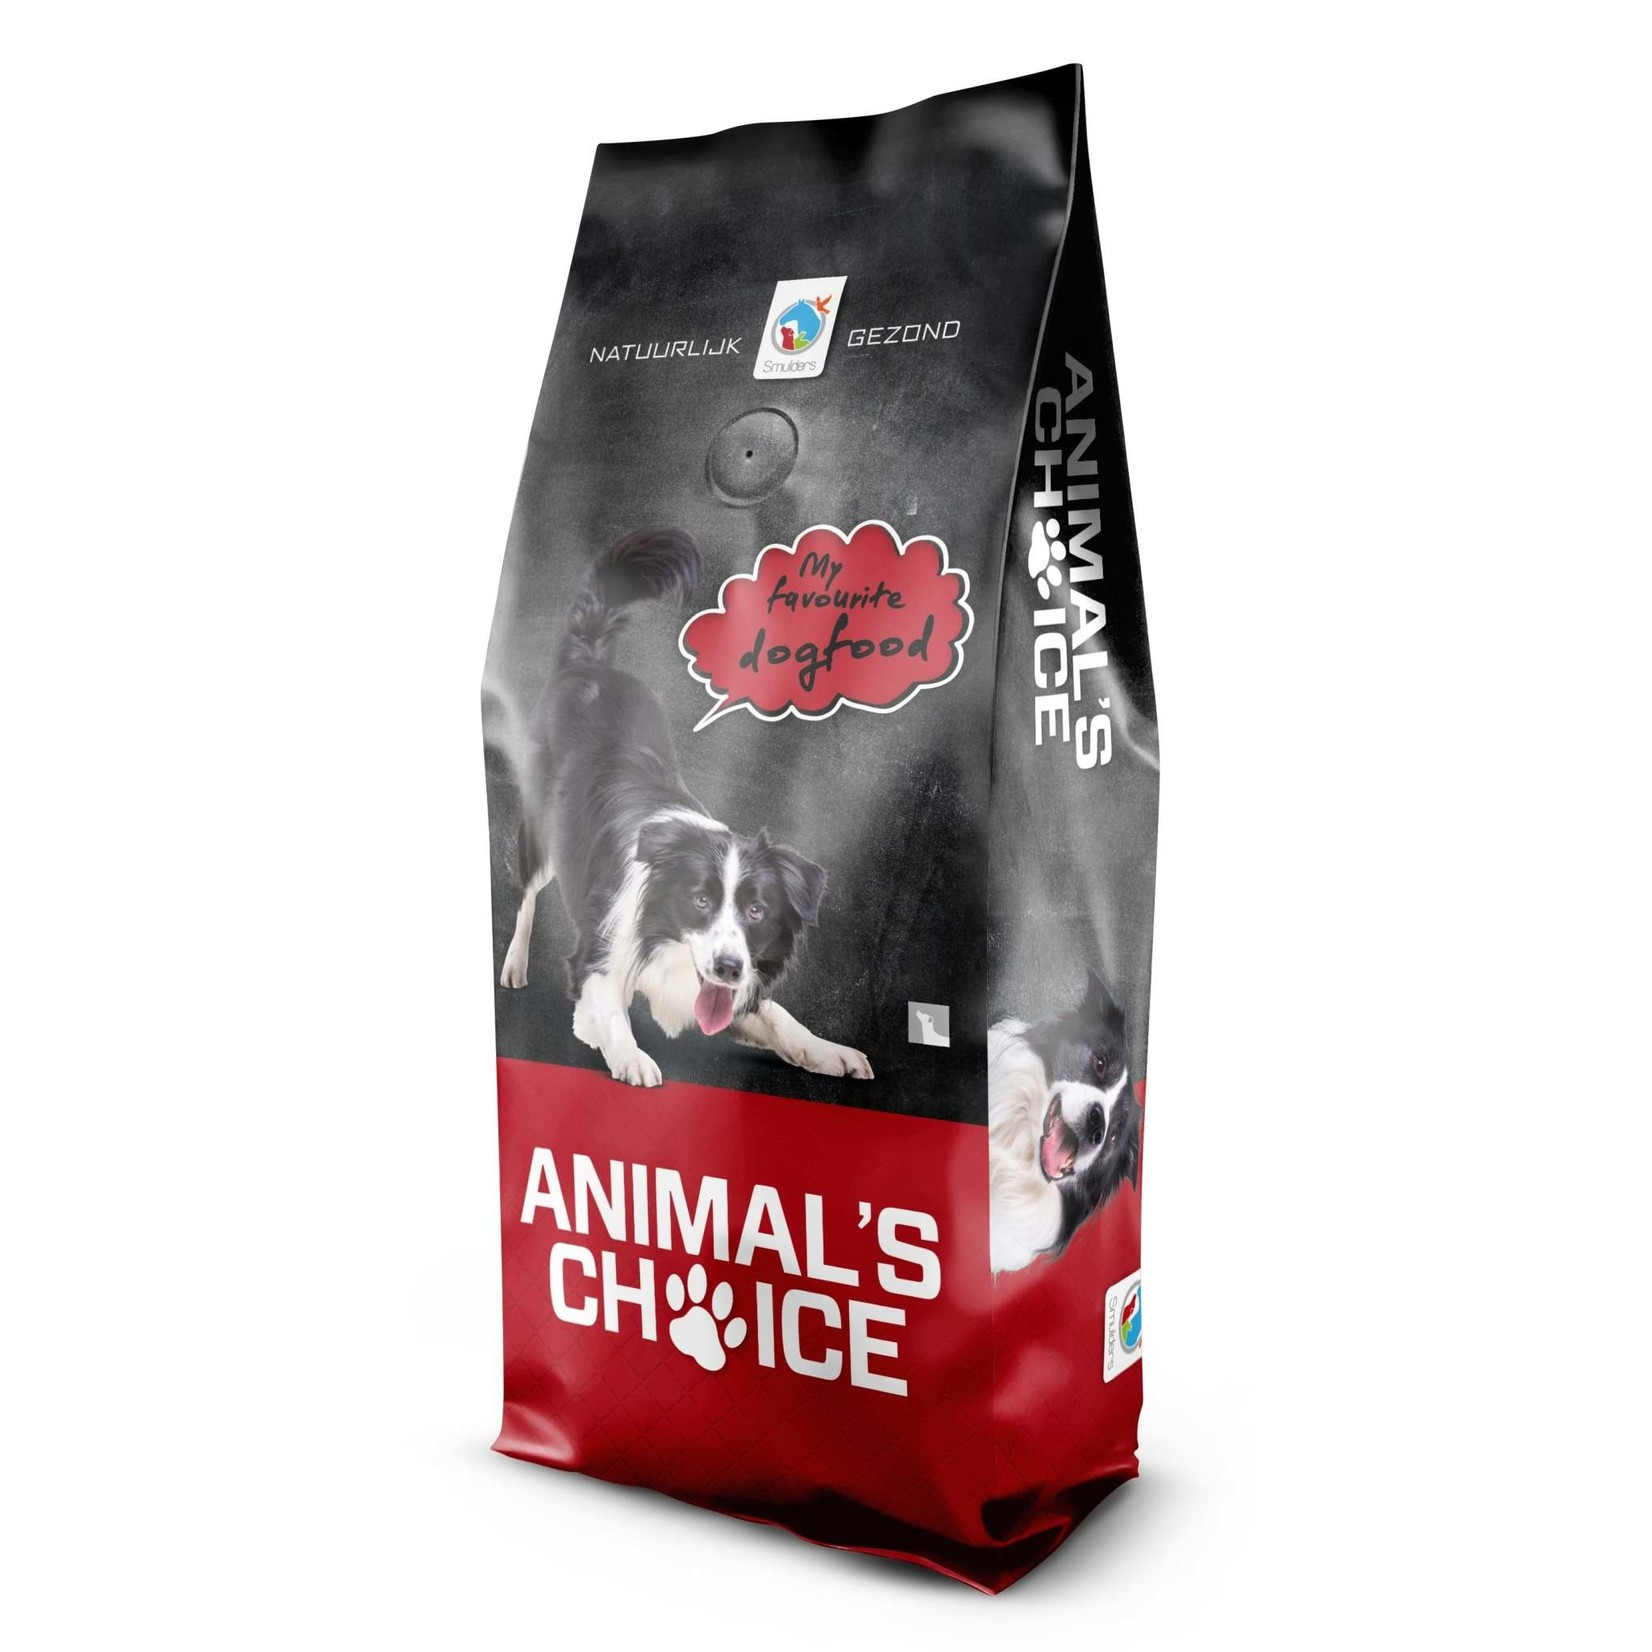 Animals Choice Animals Choice Pressed High Energy